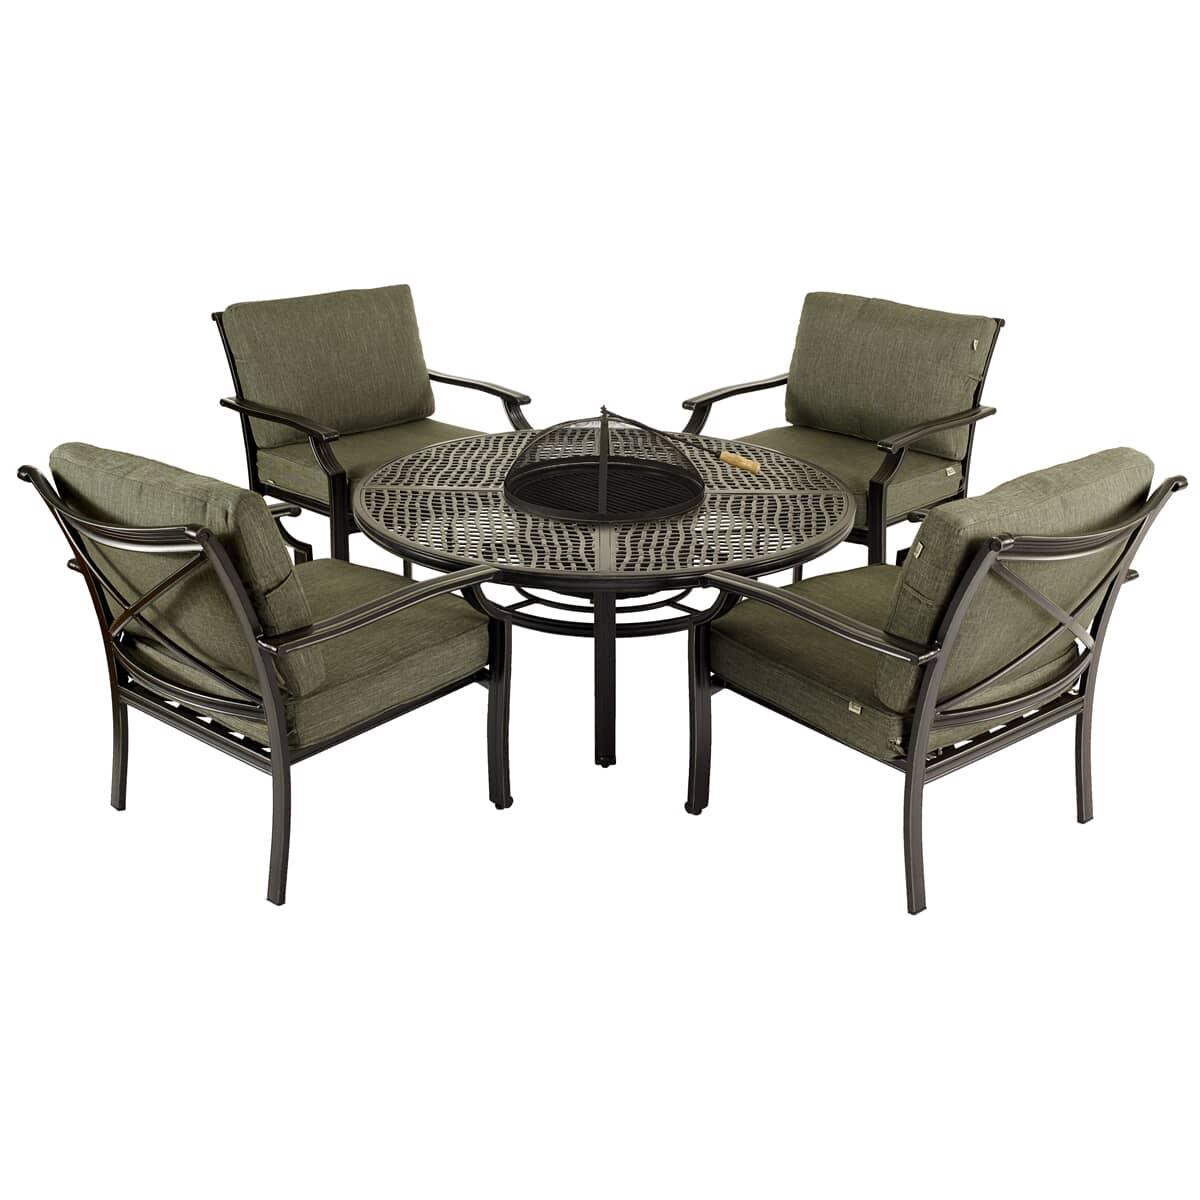 Jamie oliver fire pit set pesto 60773131 garden for Furniture world